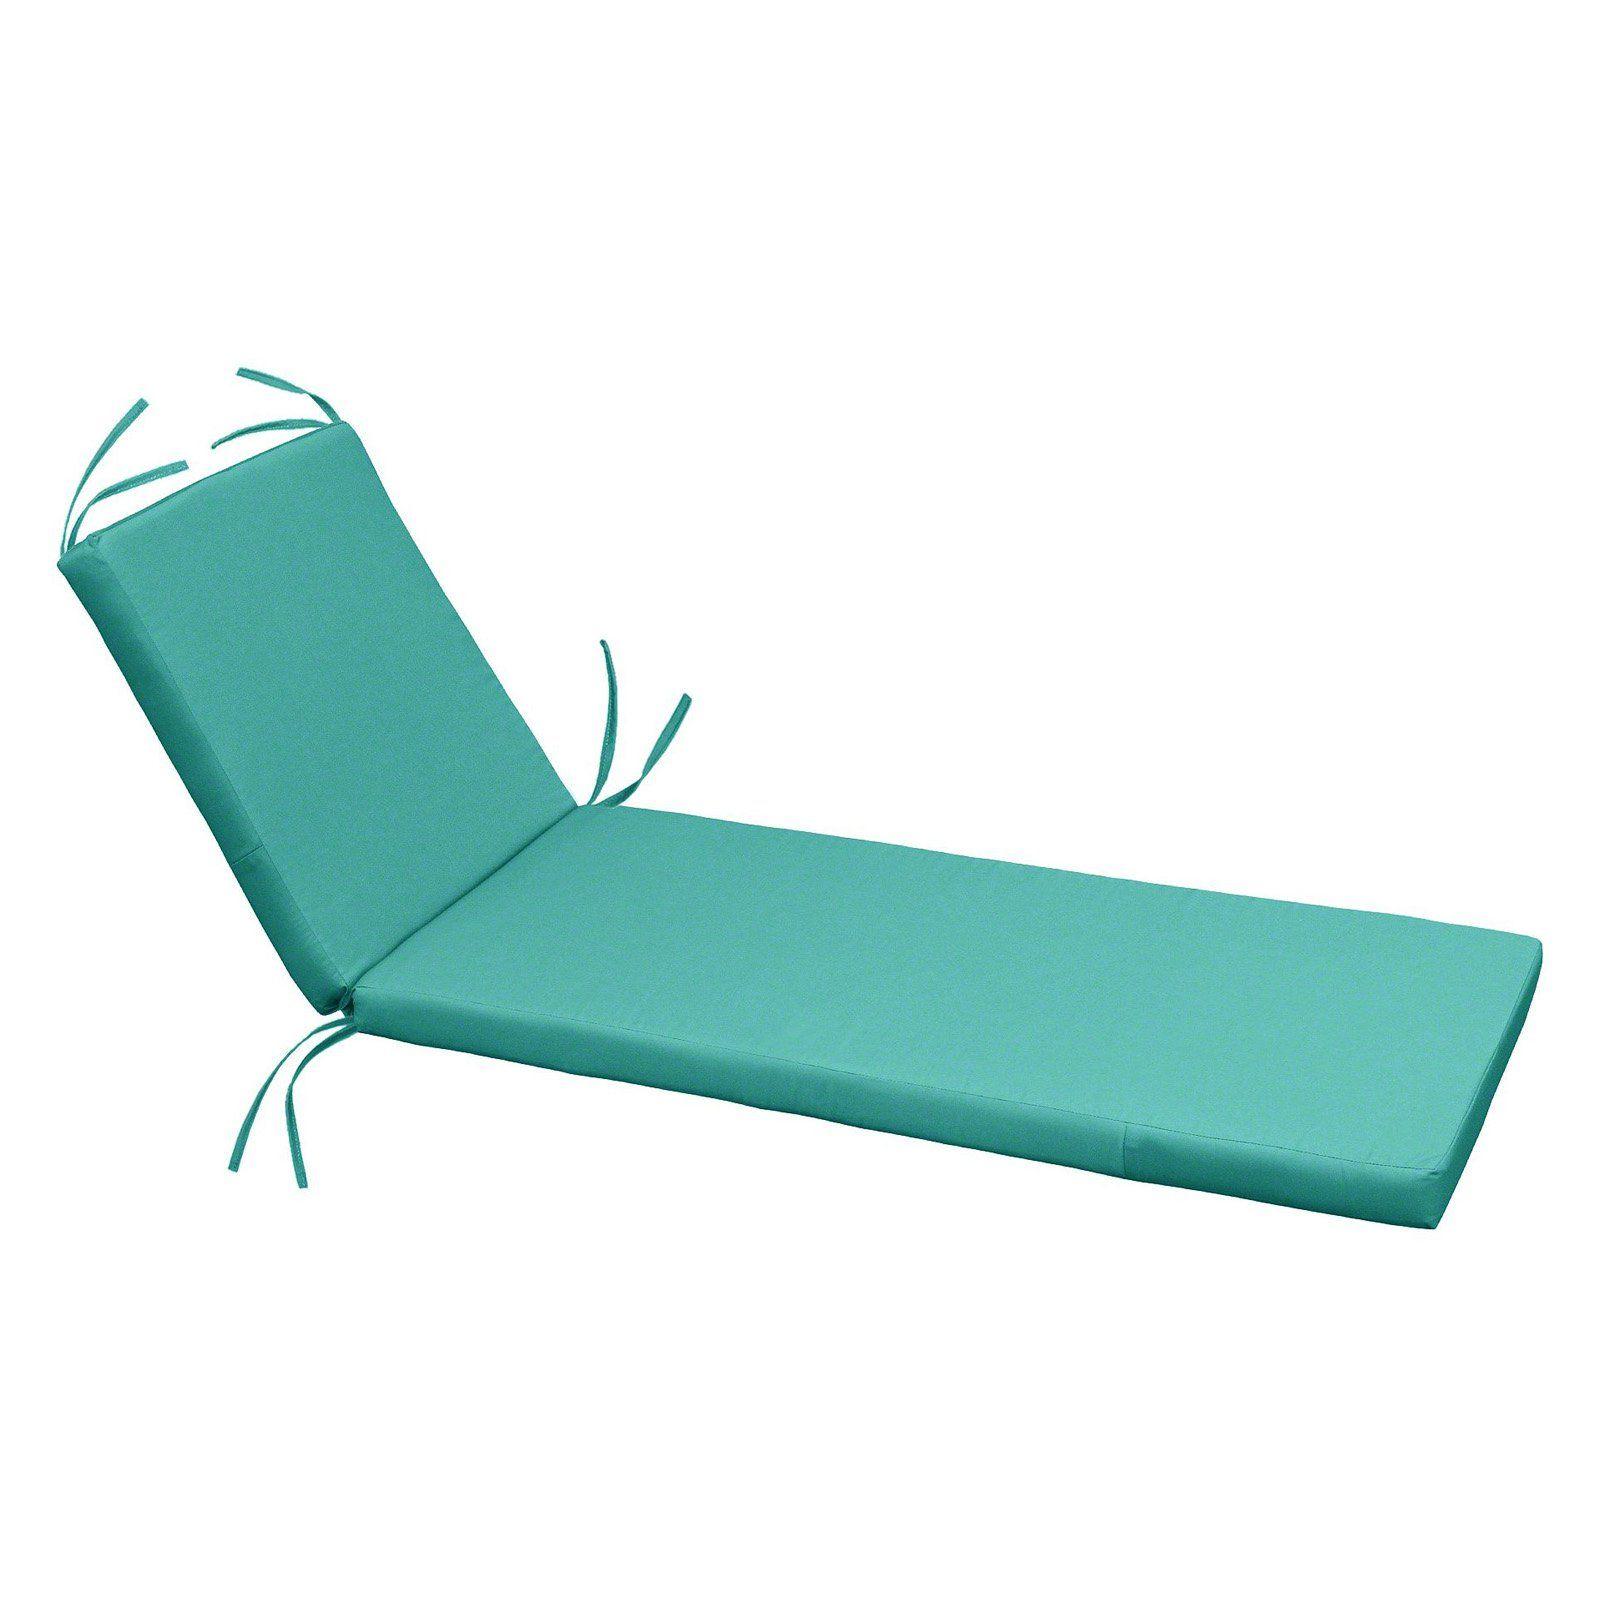 - Cushion Source 80 X 25.5 In. Solid Sunbrella Chaise Lounge Cushion